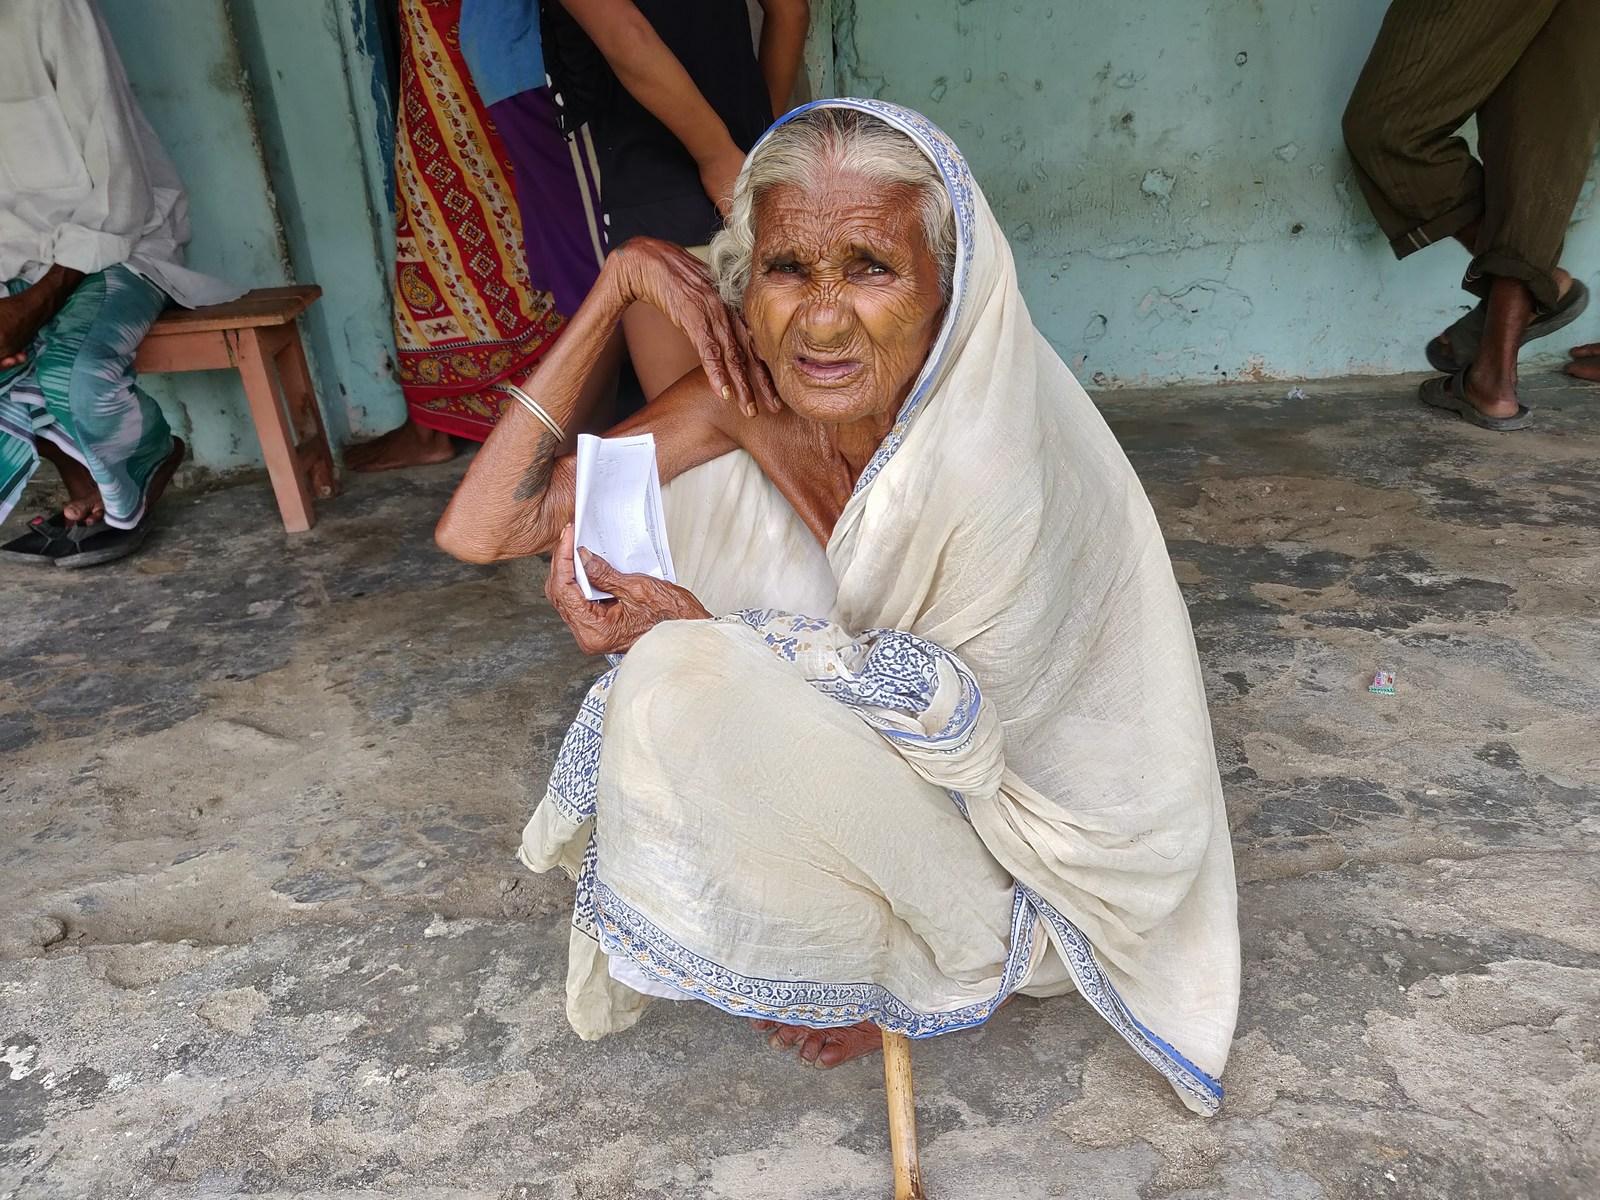 Free-Health-Camp-Eye-Screening-at-Gwala-Basti-Mechinagar-15-Jhapa-Nepal-Rotary-Club-of-Kakarvitta-23